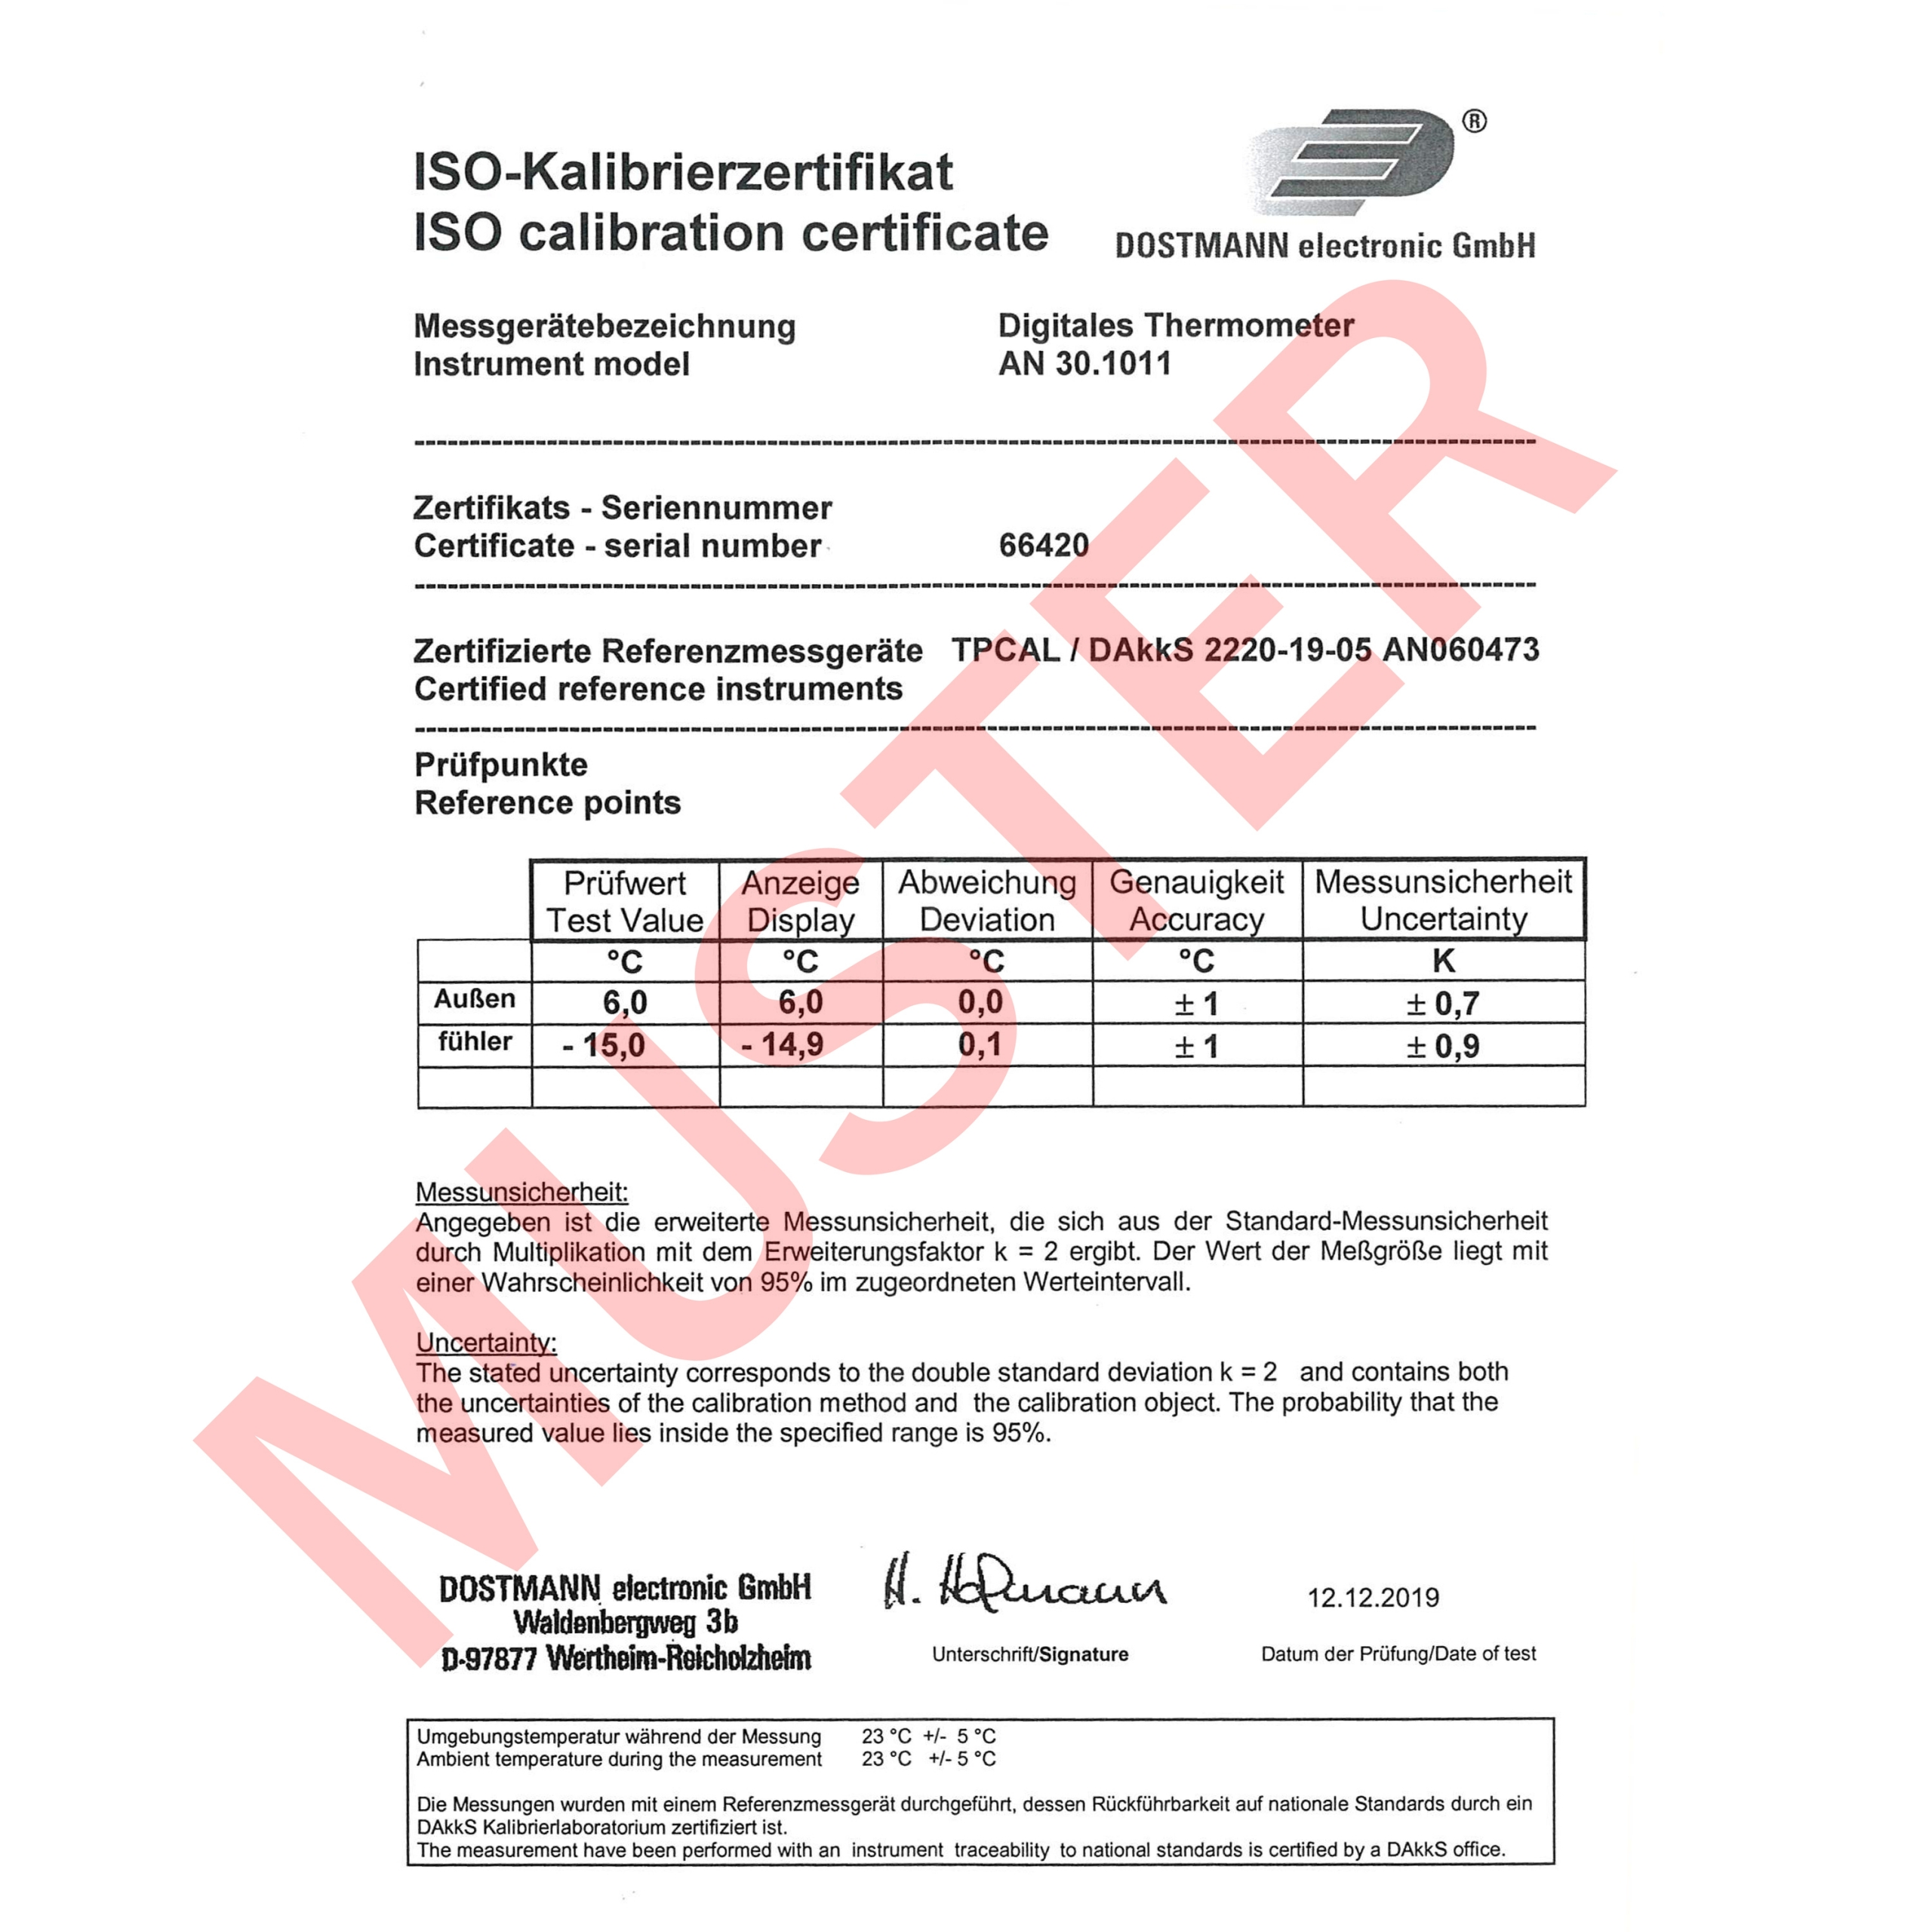 Zertifikat Muster Artikelnummer 301011.jpg